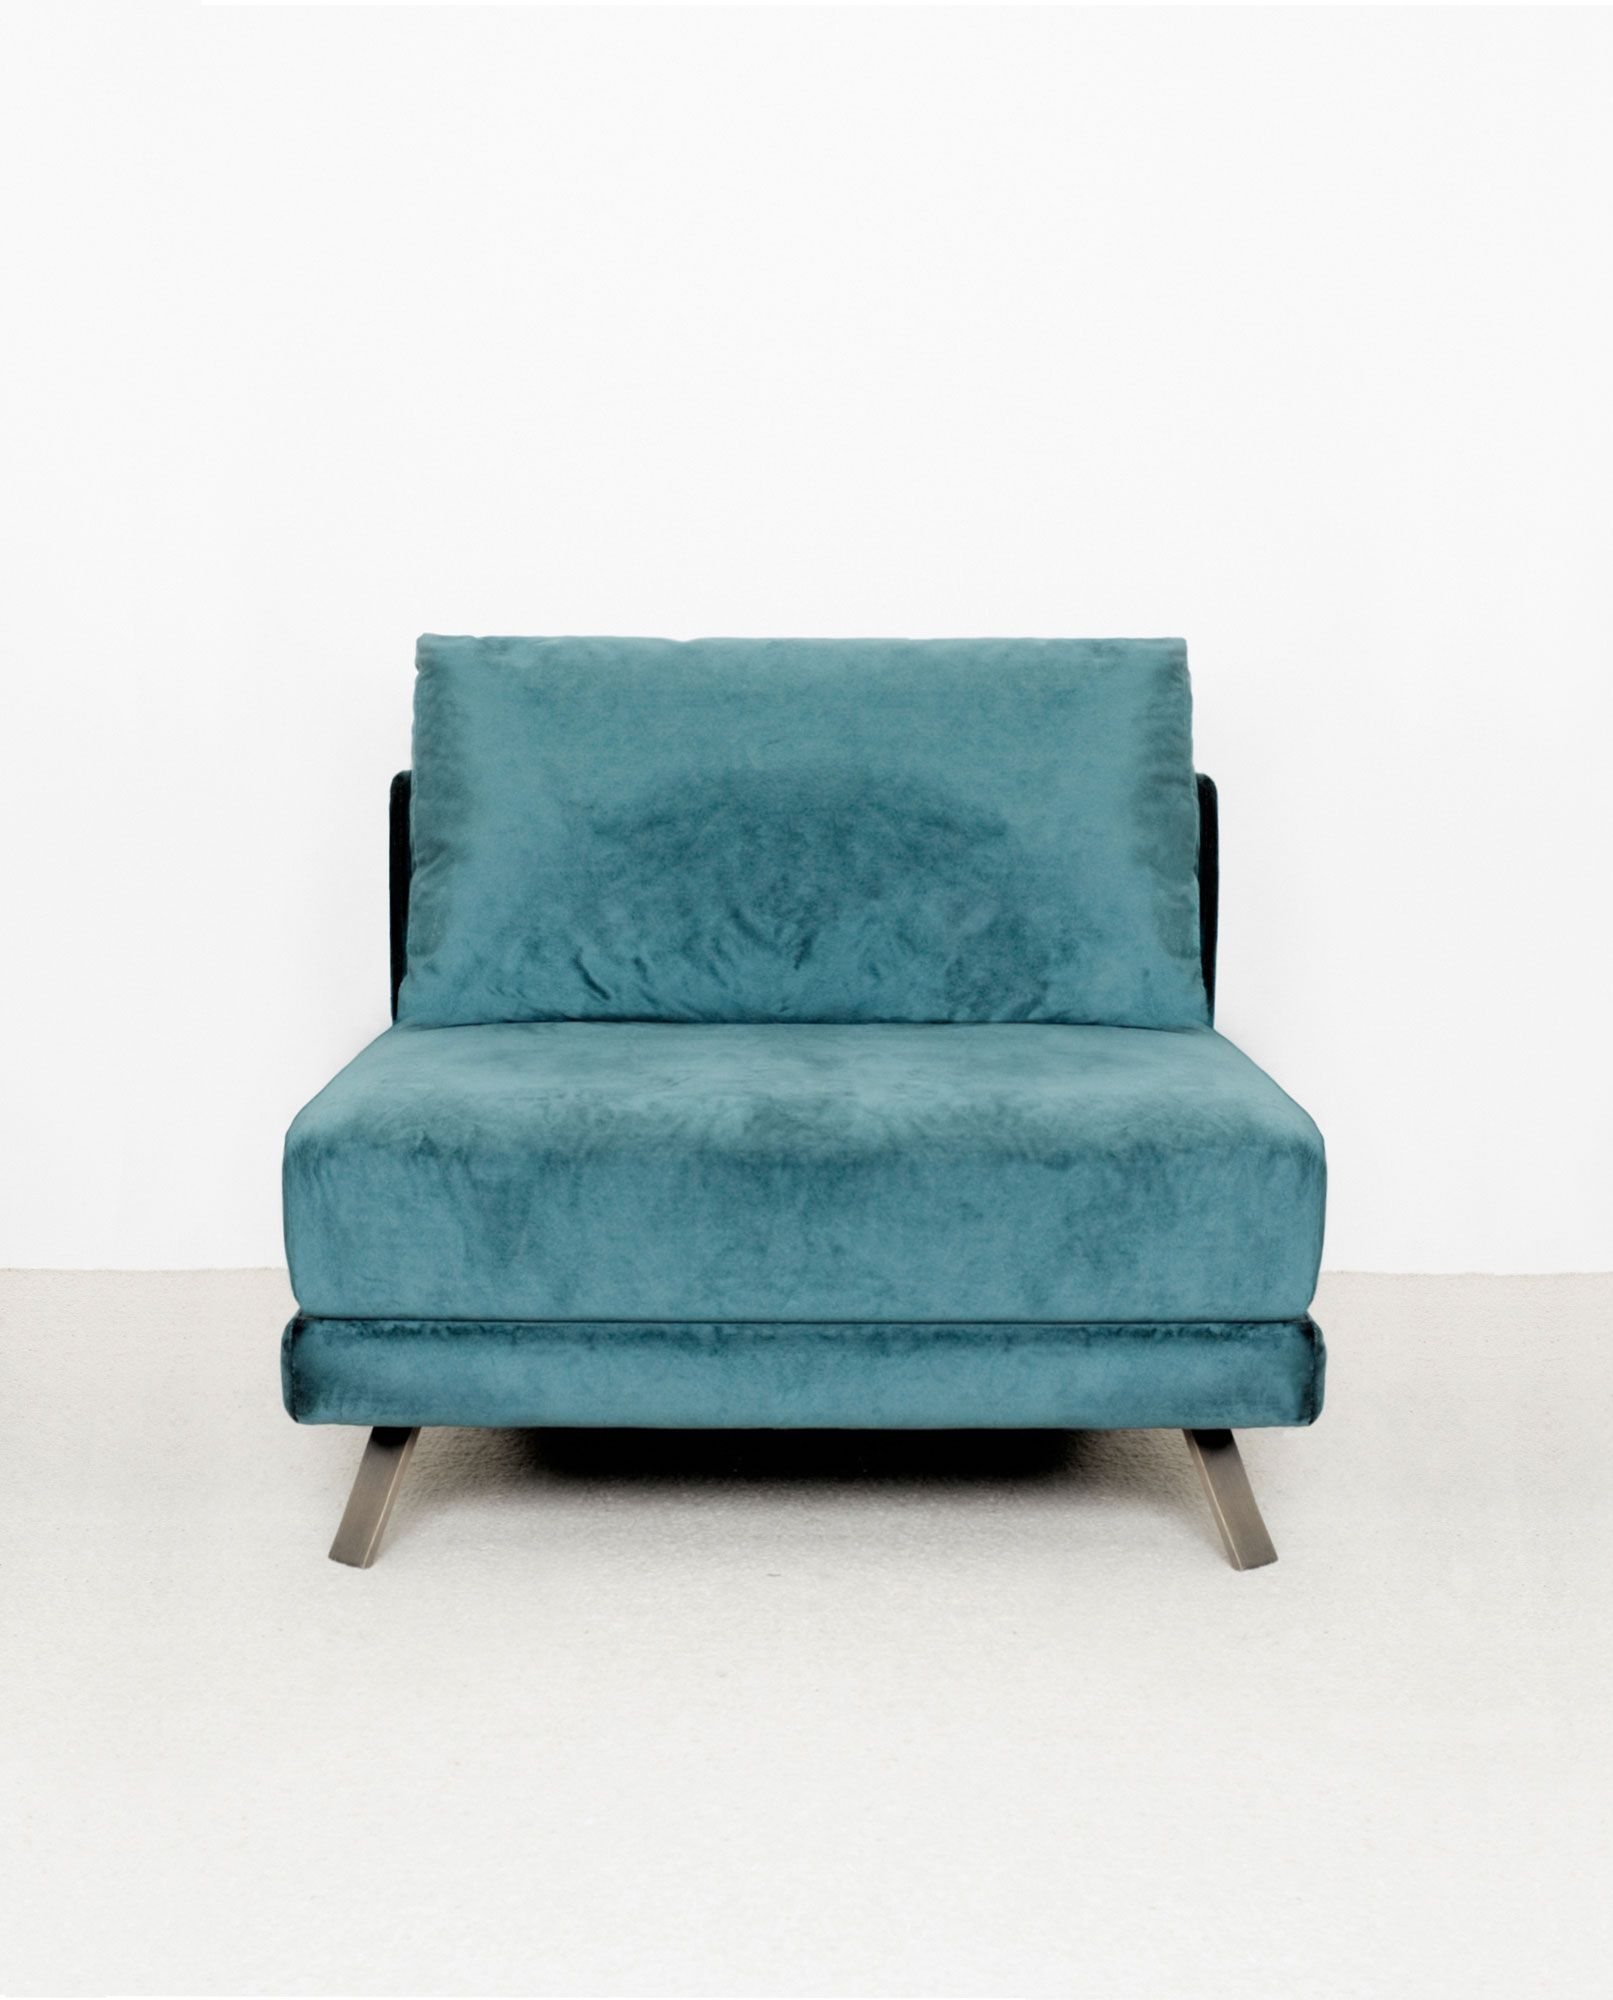 bob sofa christophe delcourt es sahel sofascore fauteuil ian sit pinterest